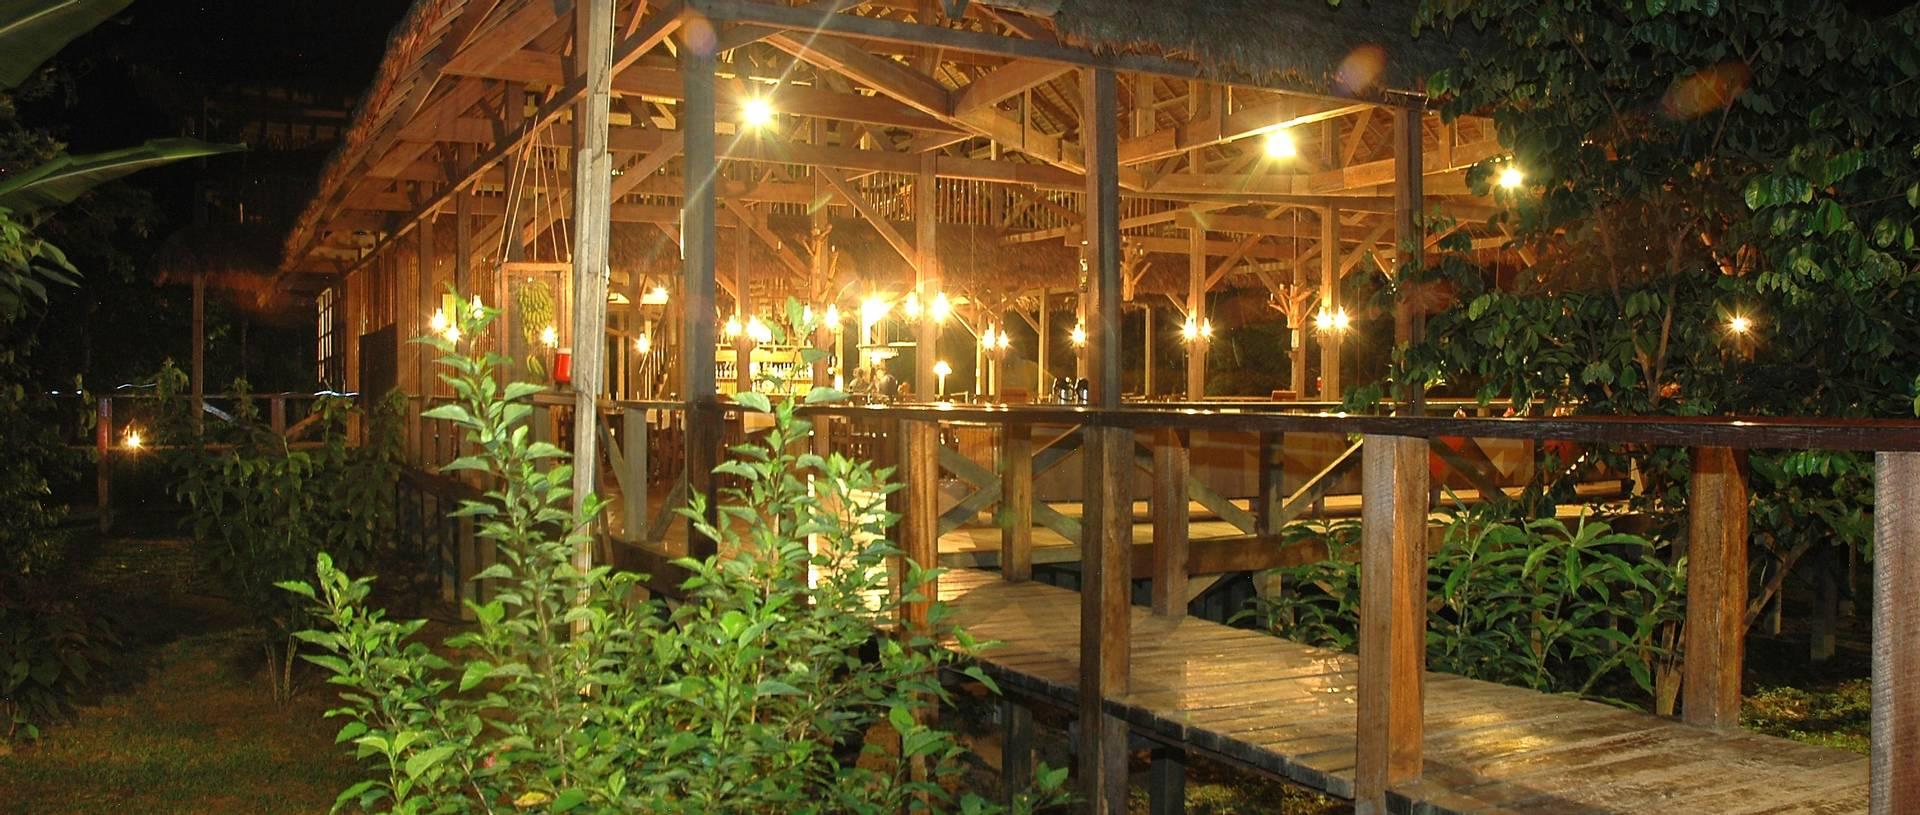 Refugio Amazonas By Night